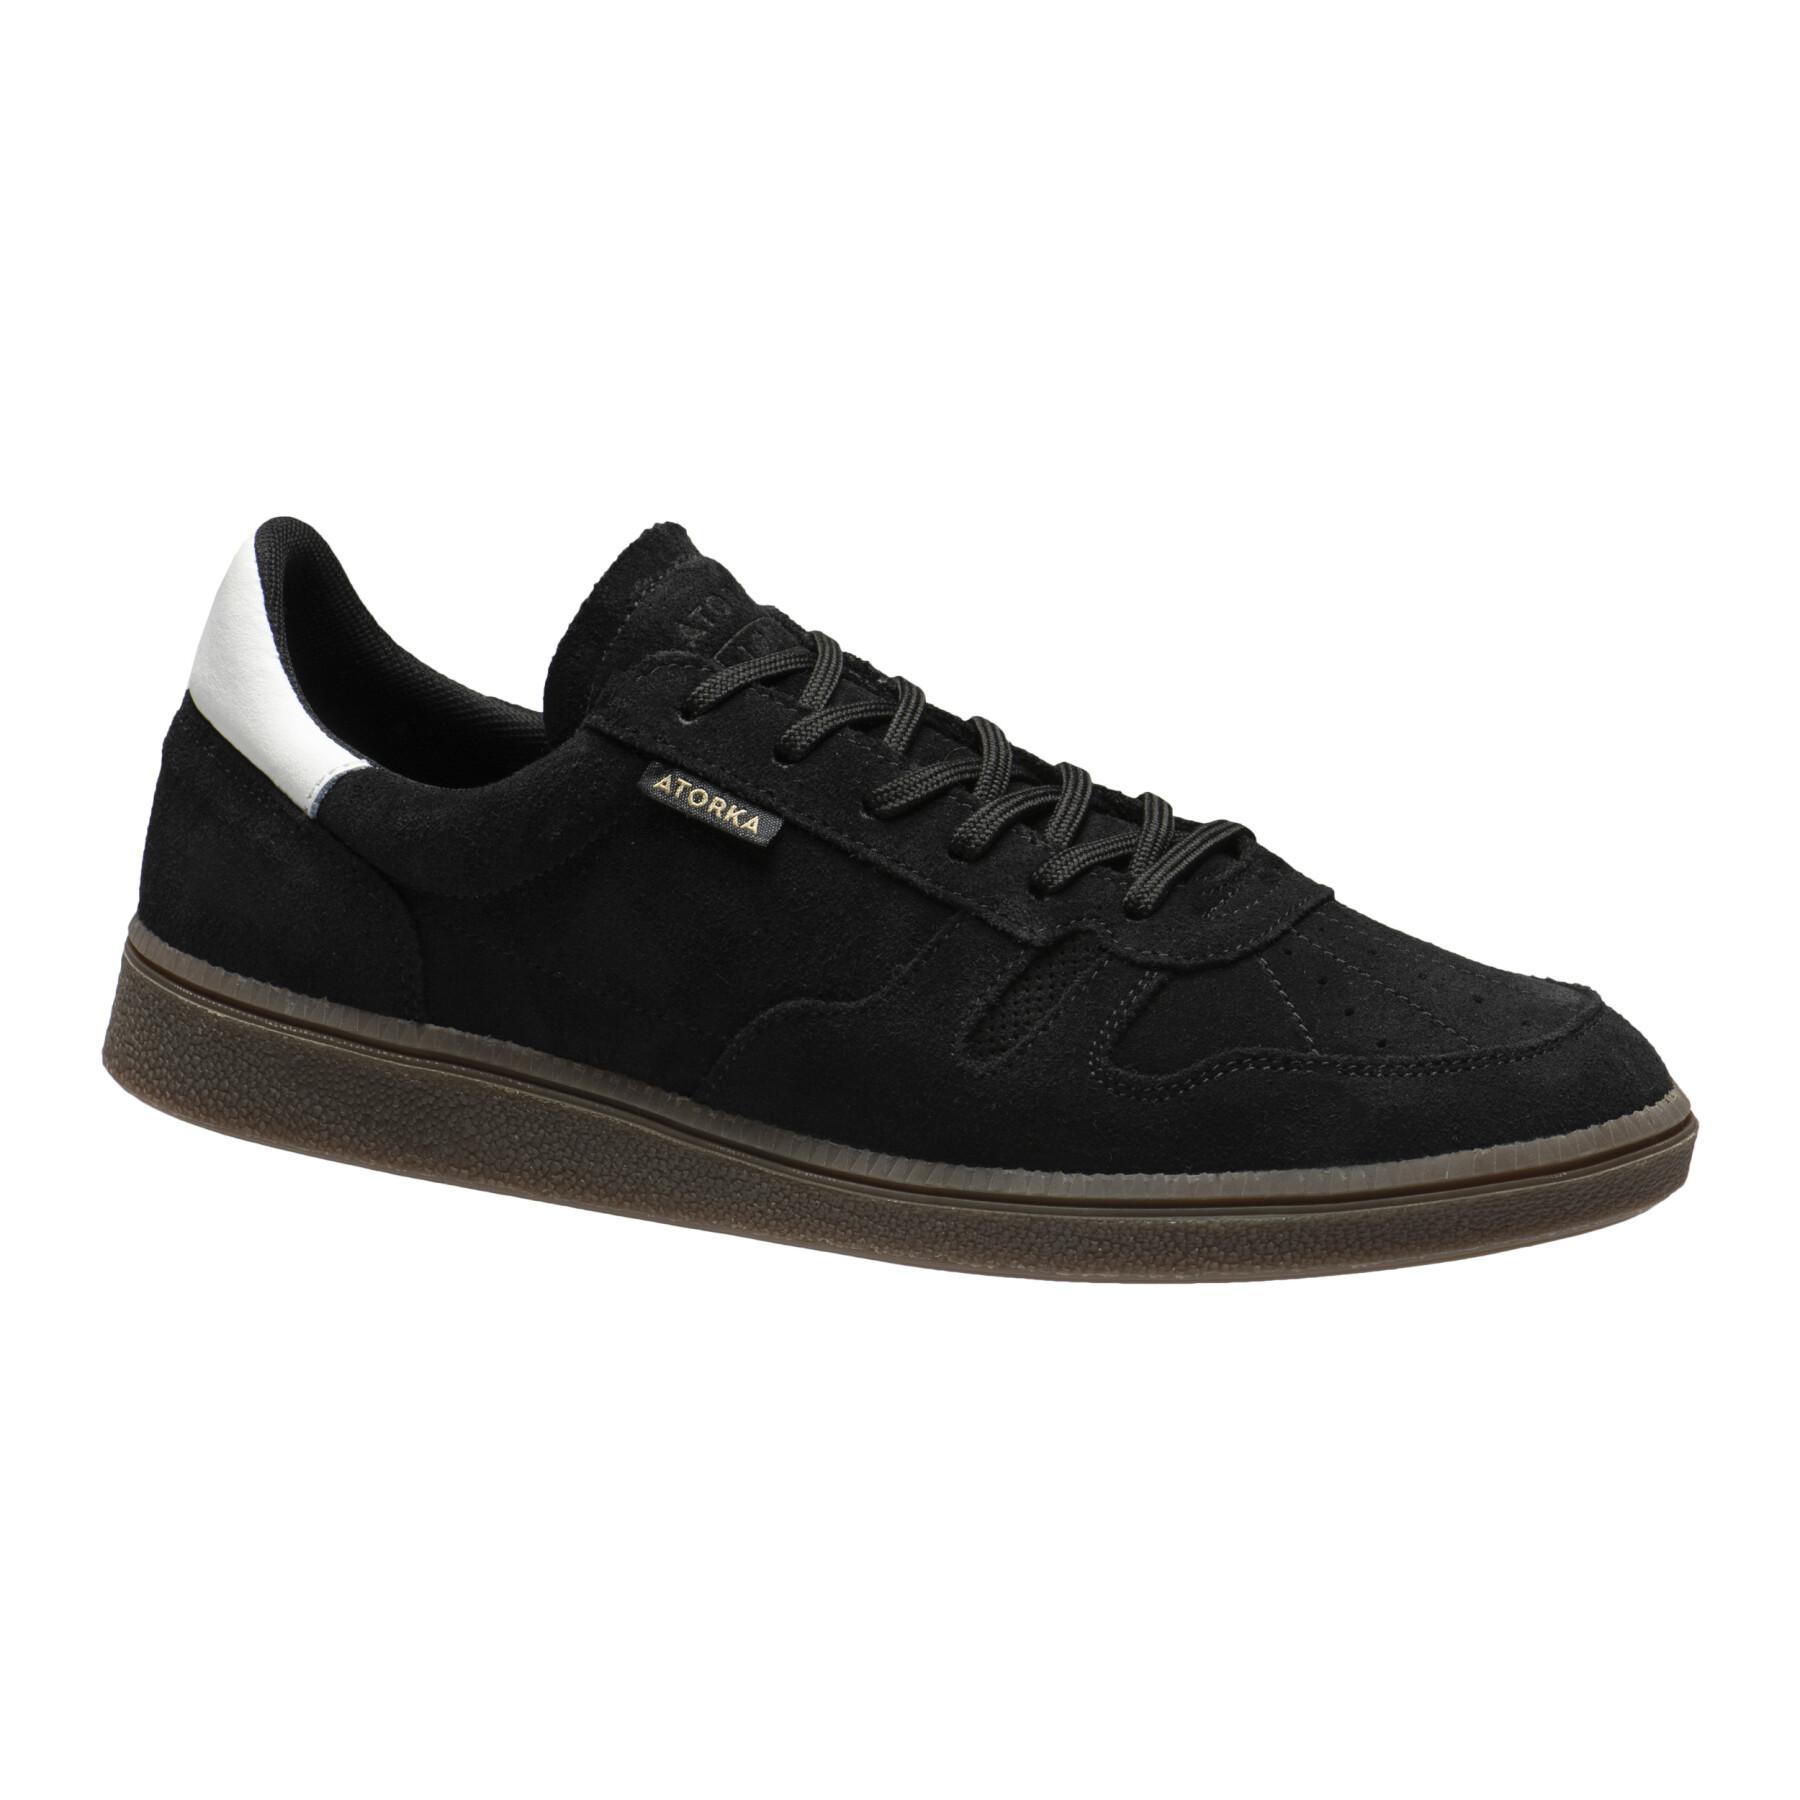 Shoes Atorka GK500